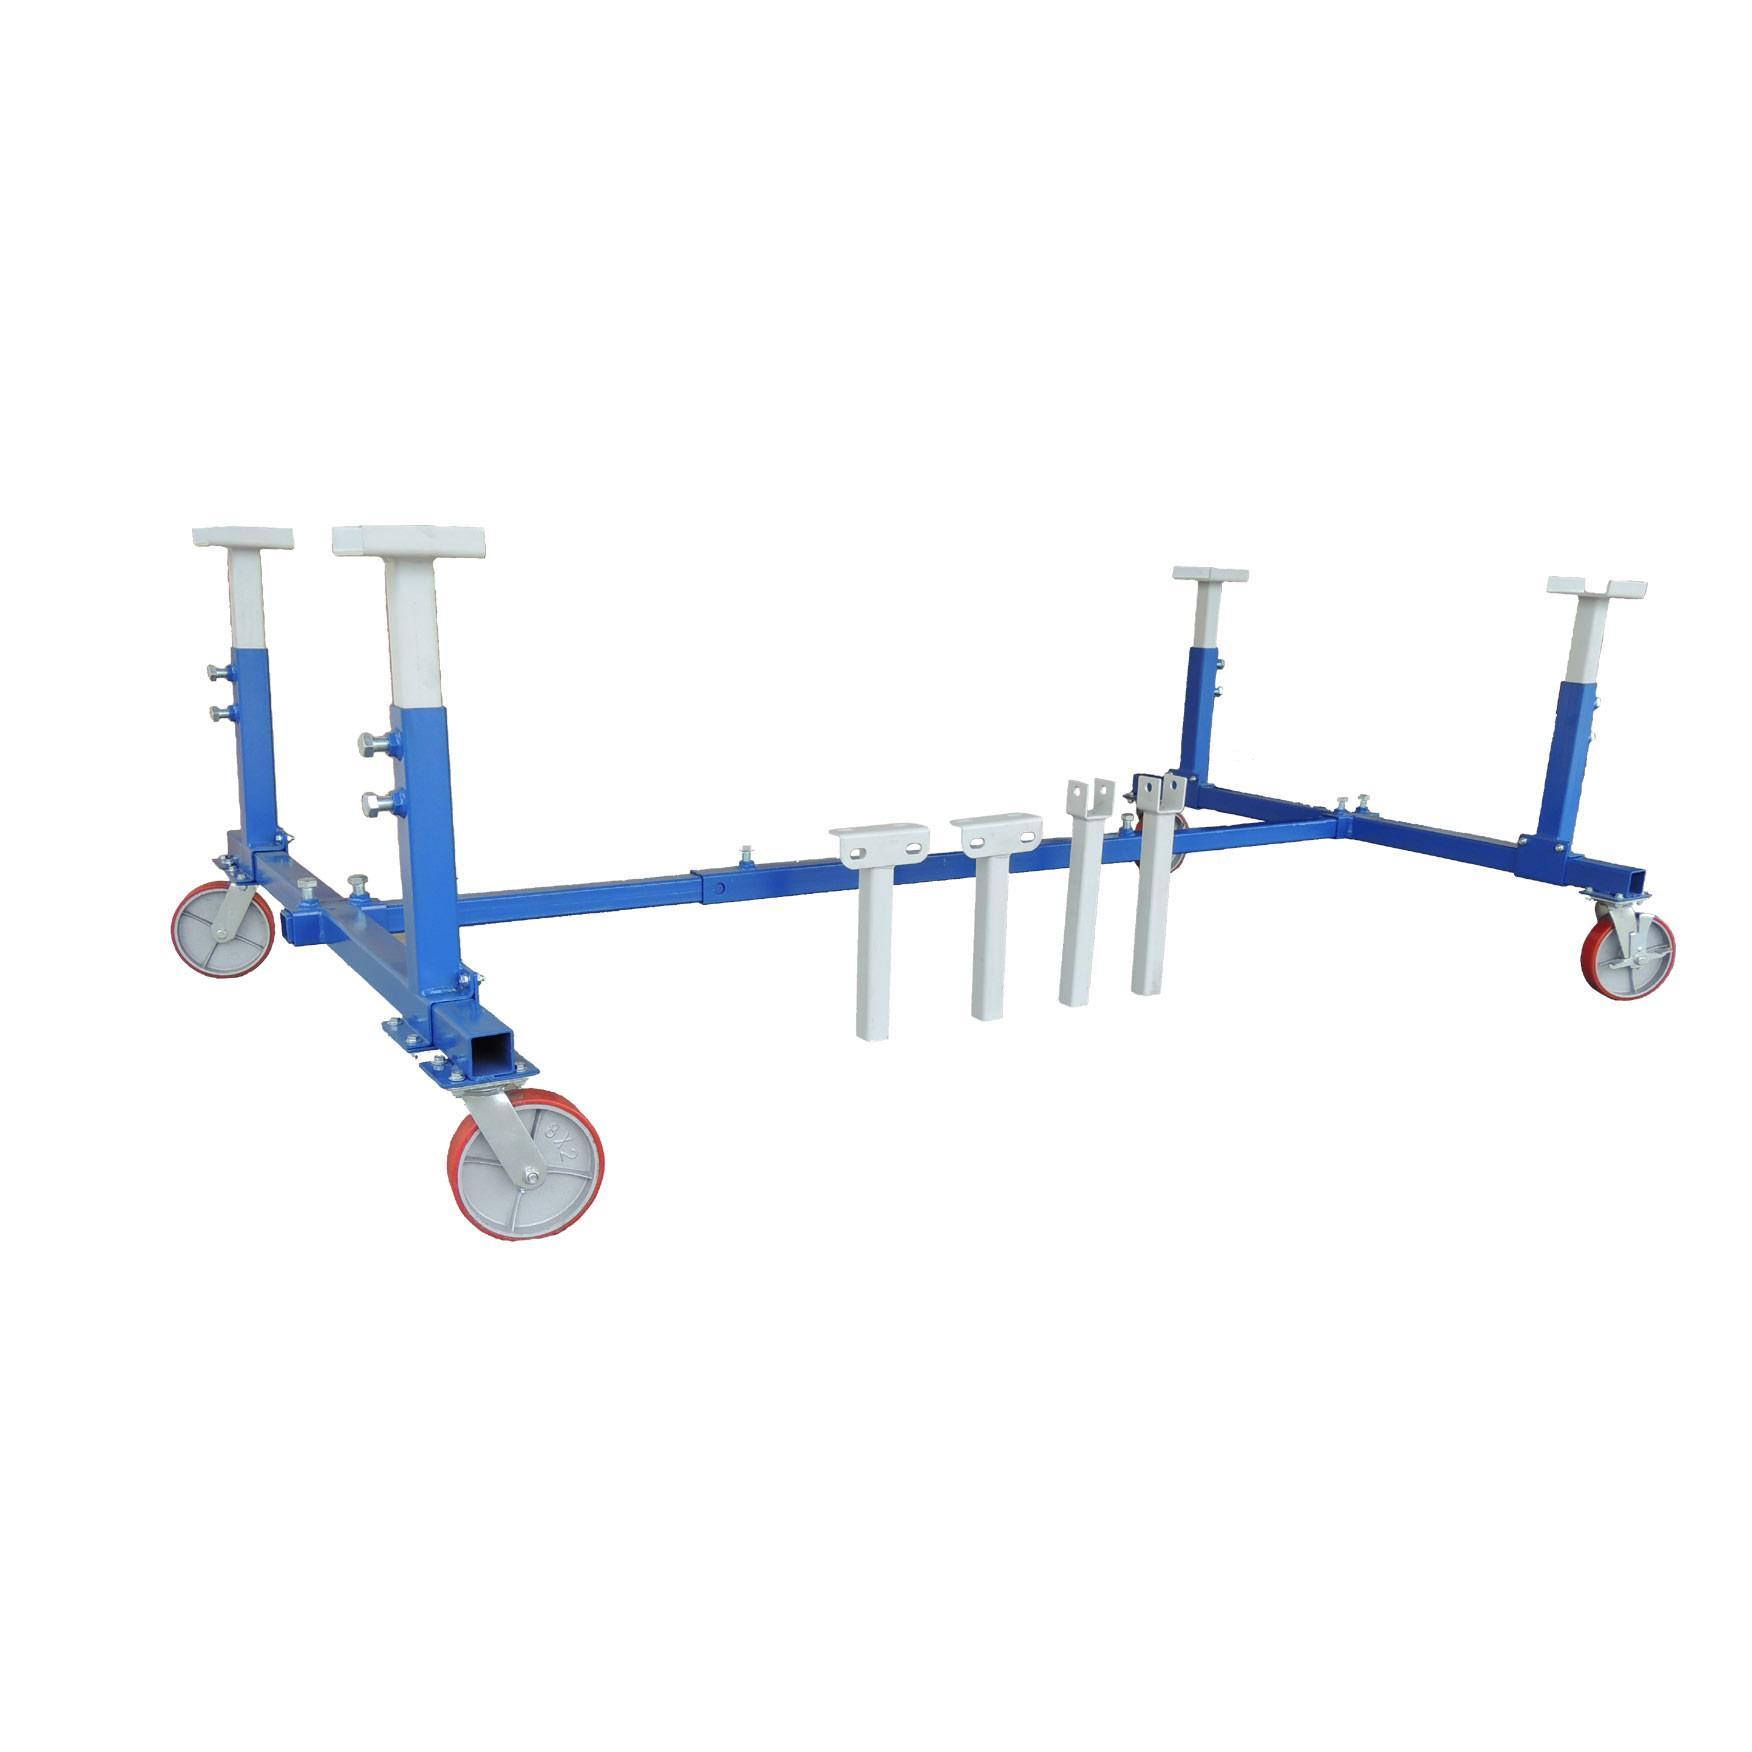 Kernel Bca 3000 Adjustable Auto Body Cart Dolly